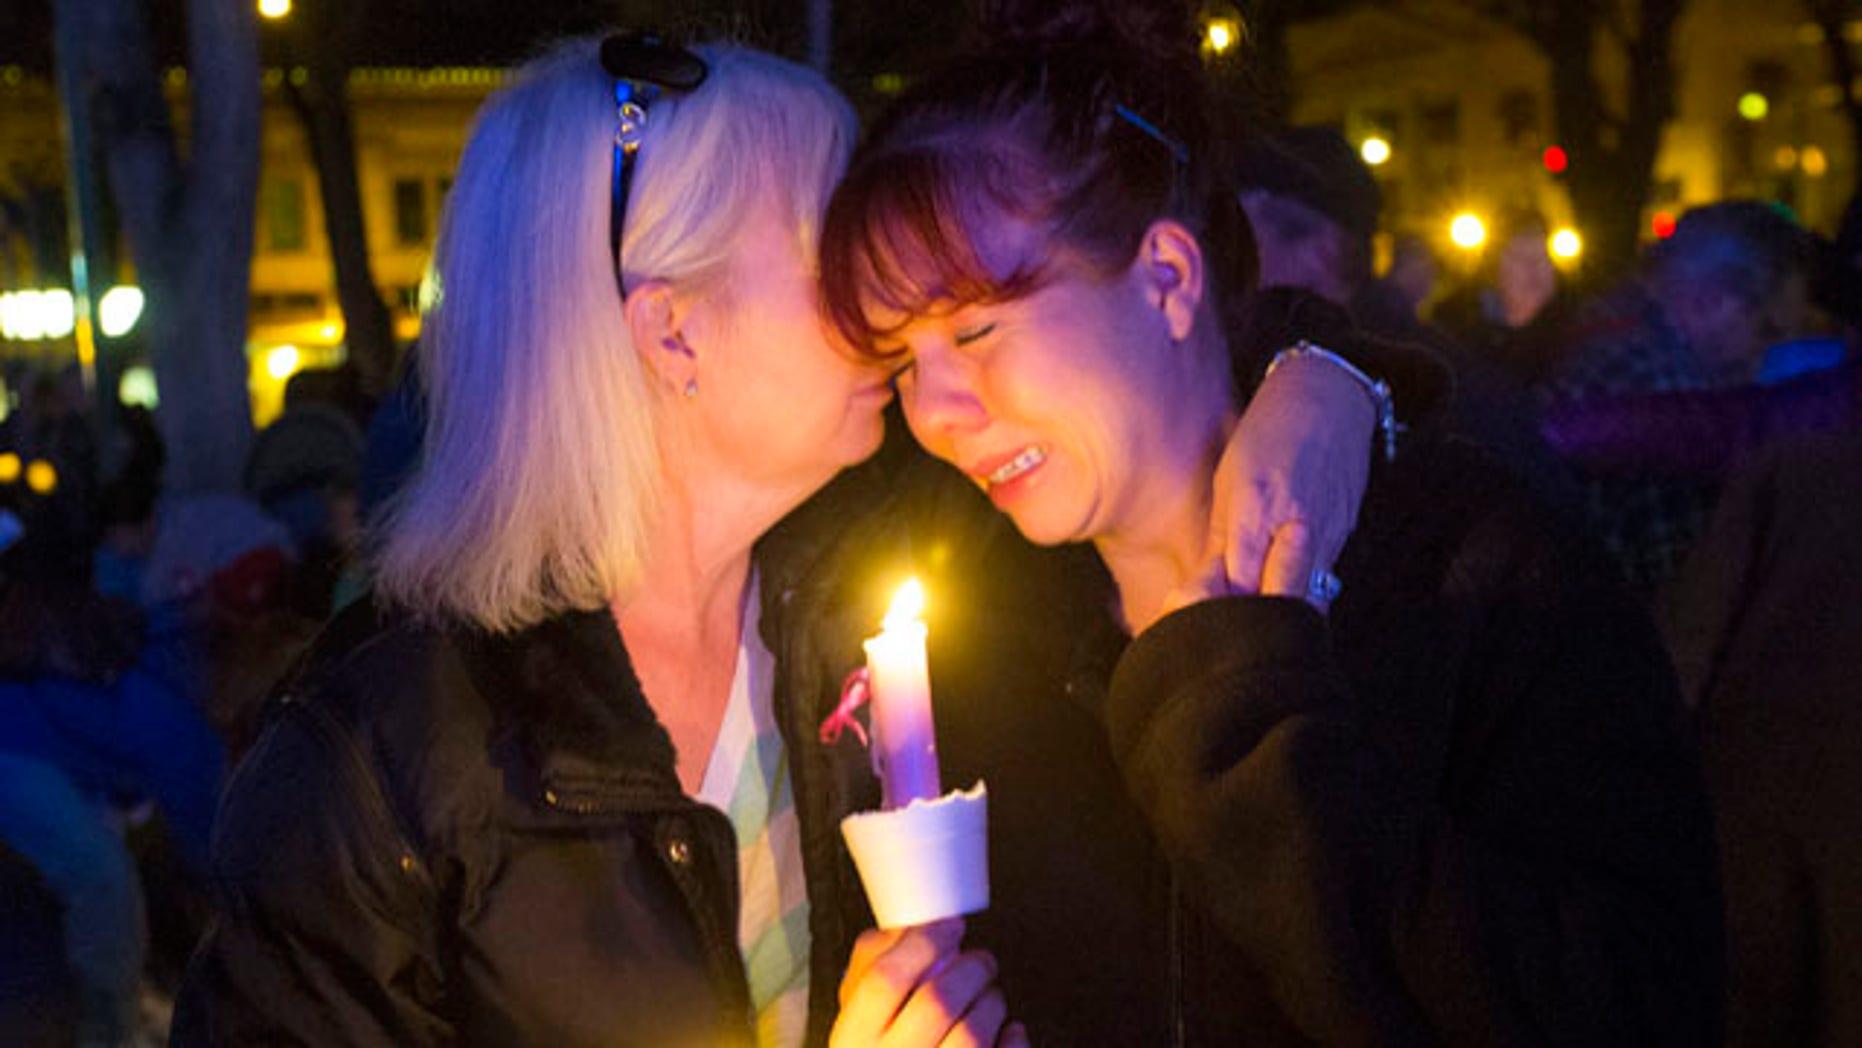 Feb. 18, 2015: Tonya Castillo, left, comforts her daughter Tiffany Reid during a candlelight memorial for Kayla Mueller in Prescott, Ariz. (AP Photo/The Arizona Republic, Michael Chow)